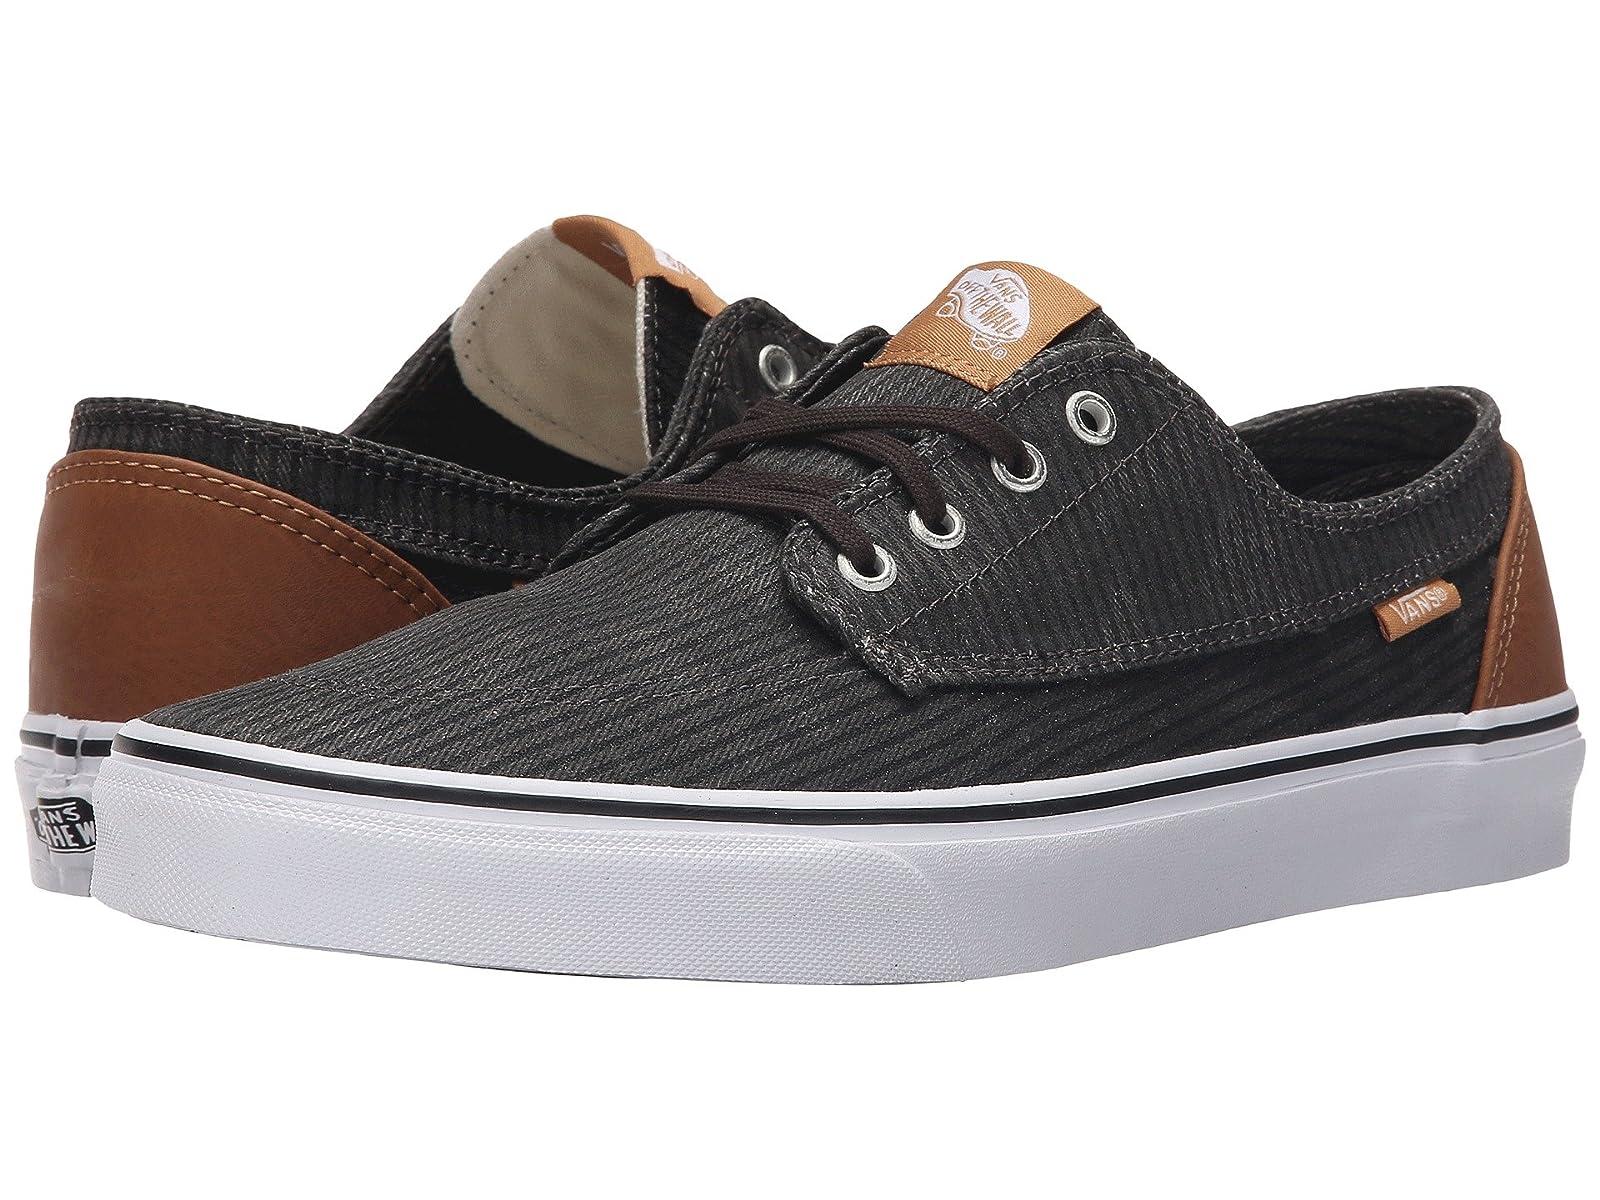 Vans BrigataCheap and distinctive eye-catching shoes